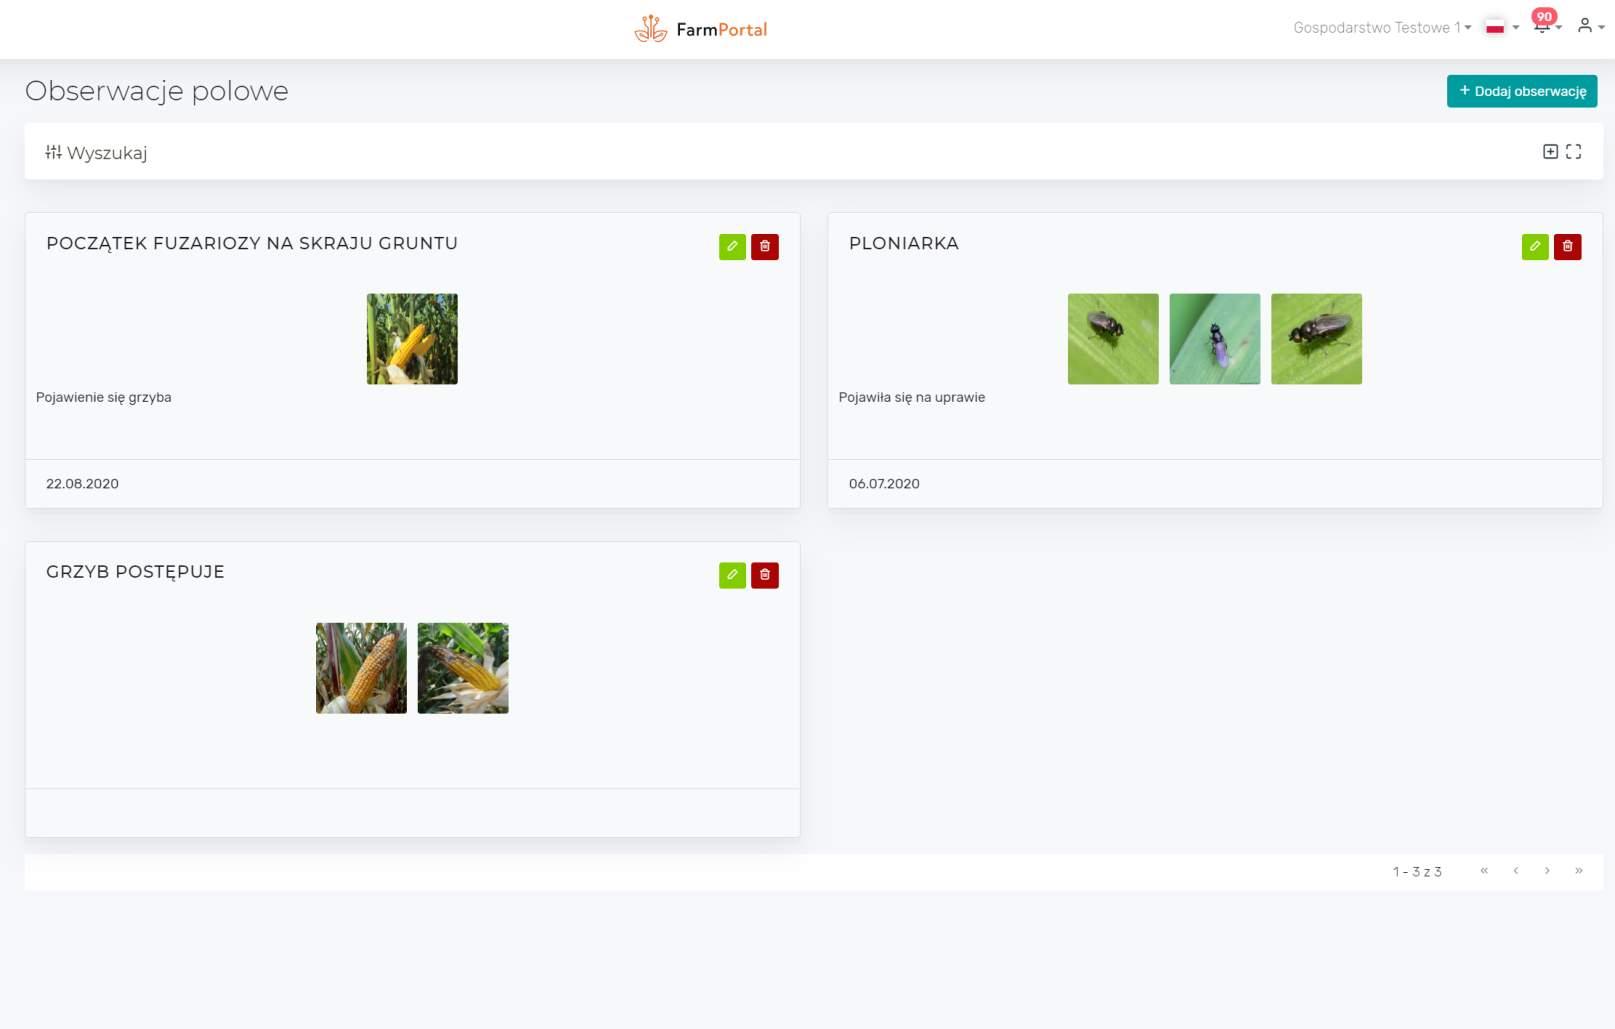 FarmPortal - Digital Crops - lista obserwacji polowych